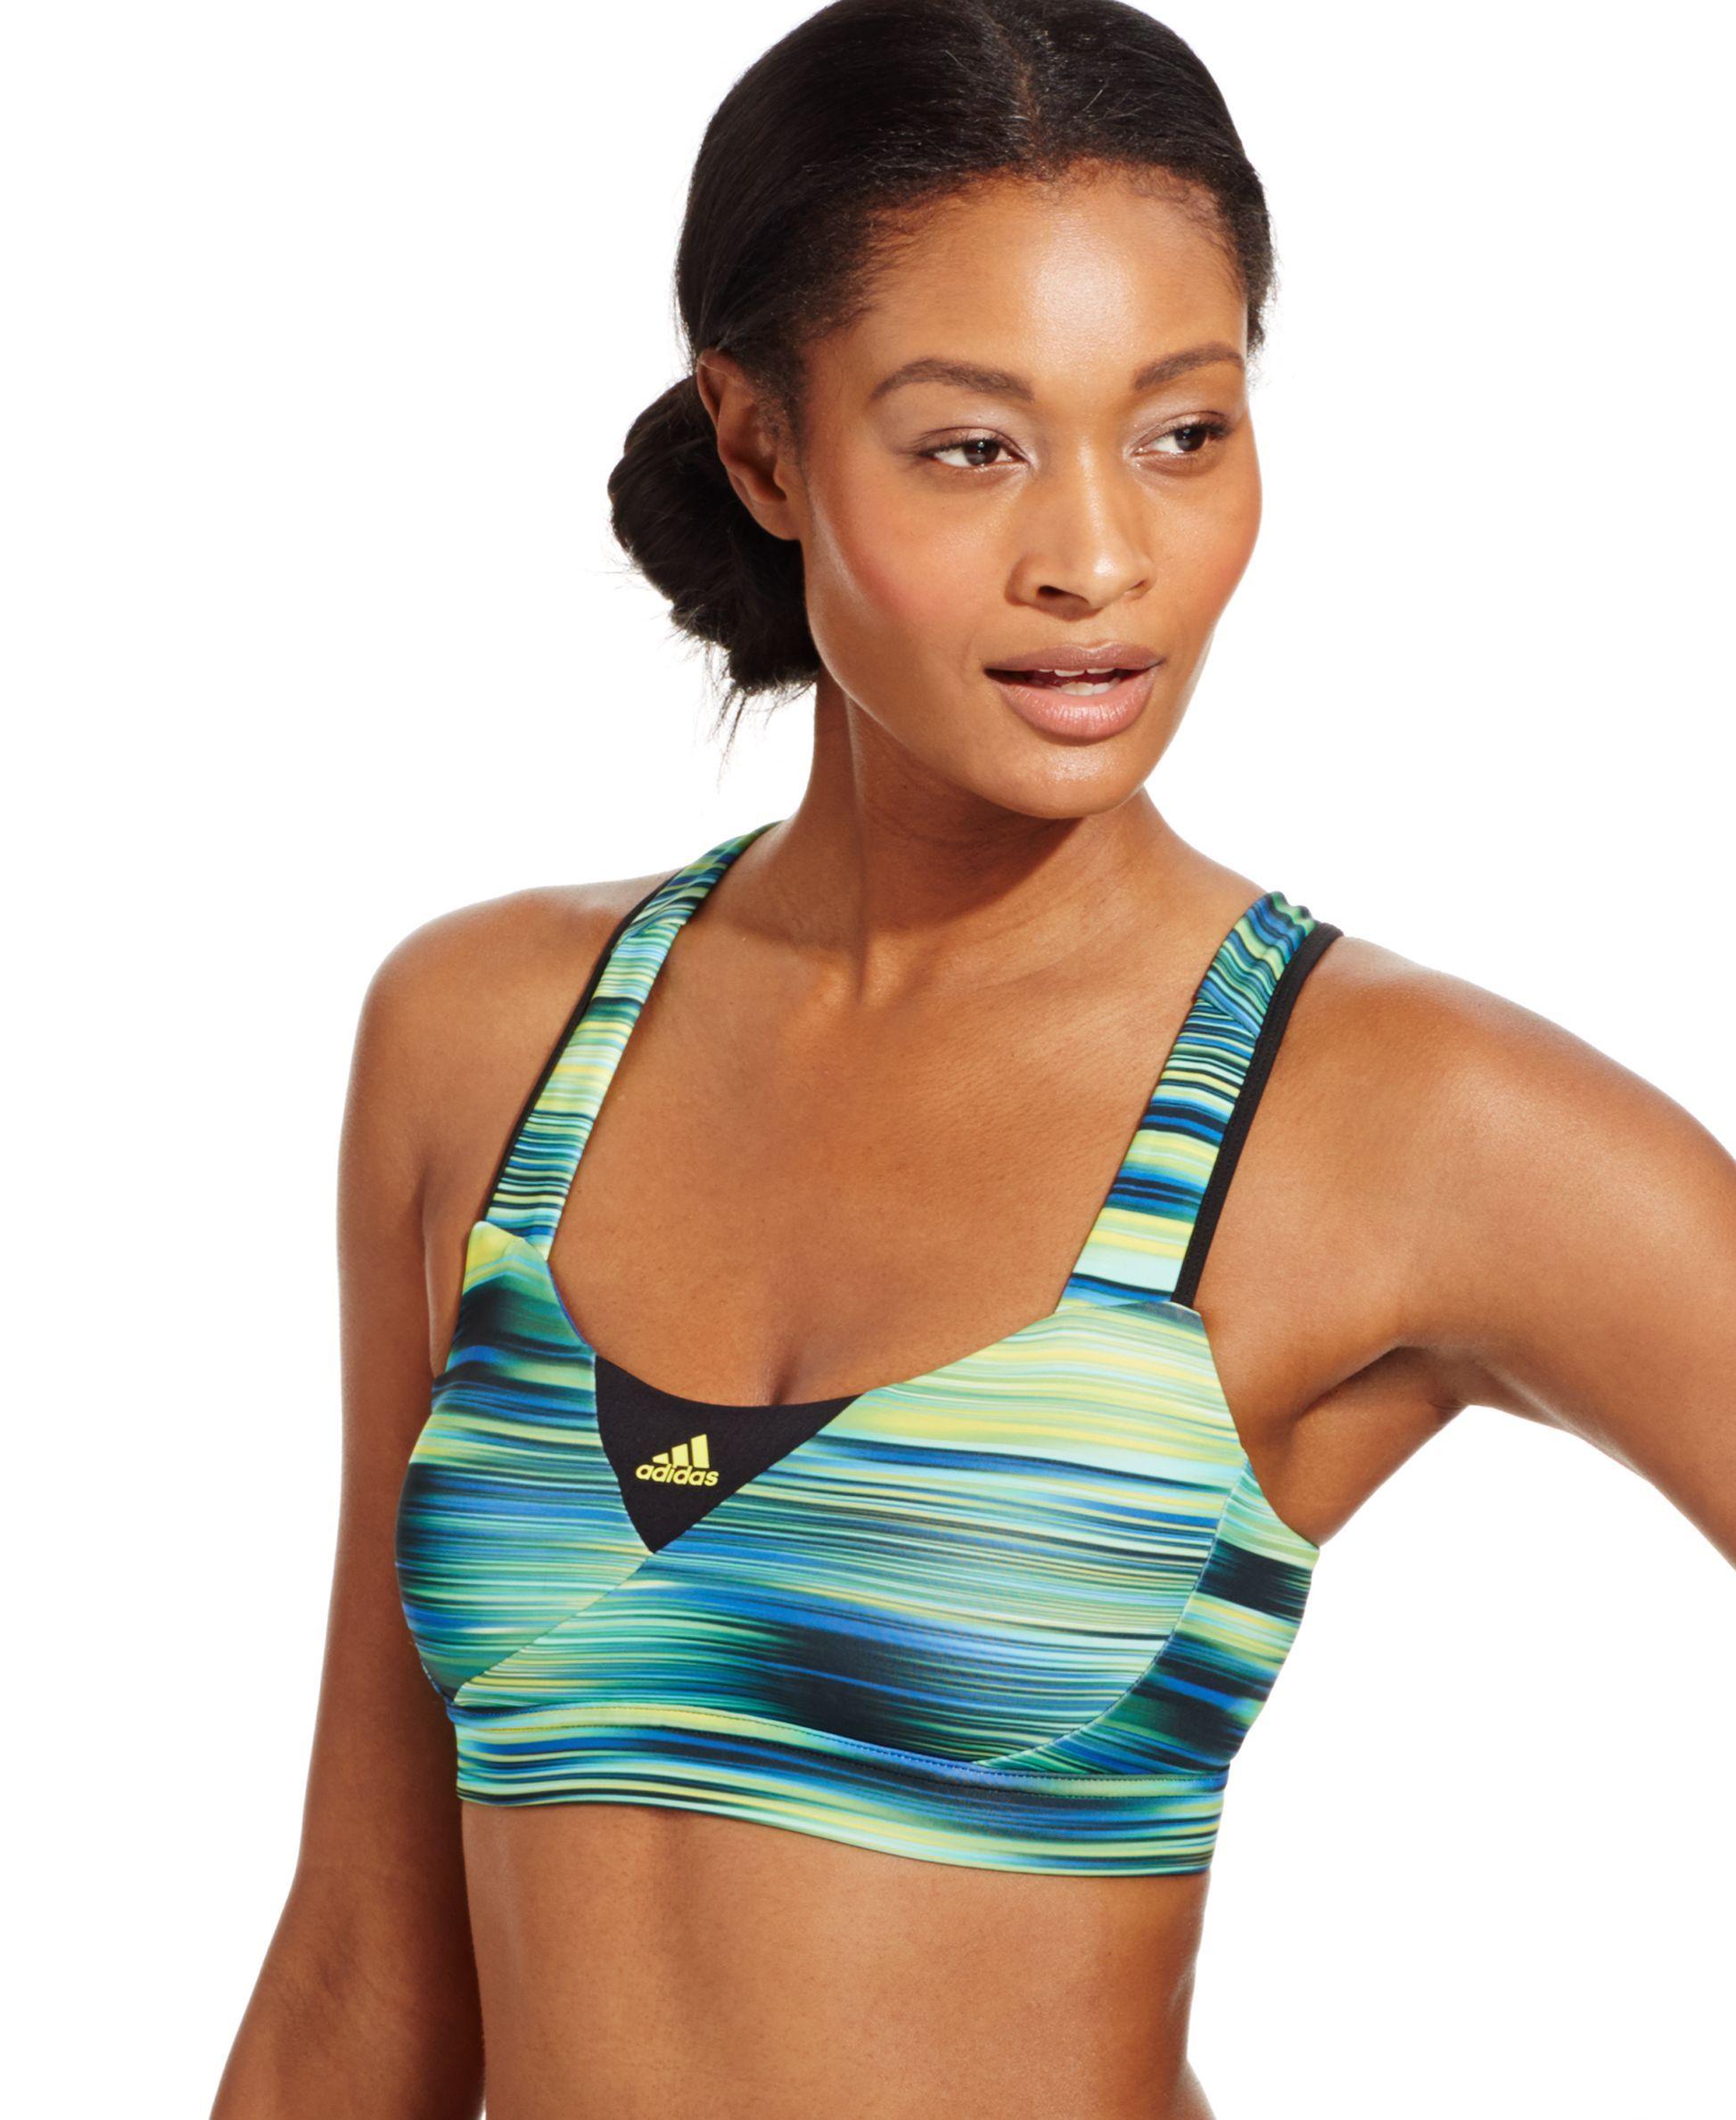 d92c85caa6e53 Tops online · Adidas Supernova Compression ClimaCool® High-Impact Sports Bra  - Women - Macy s